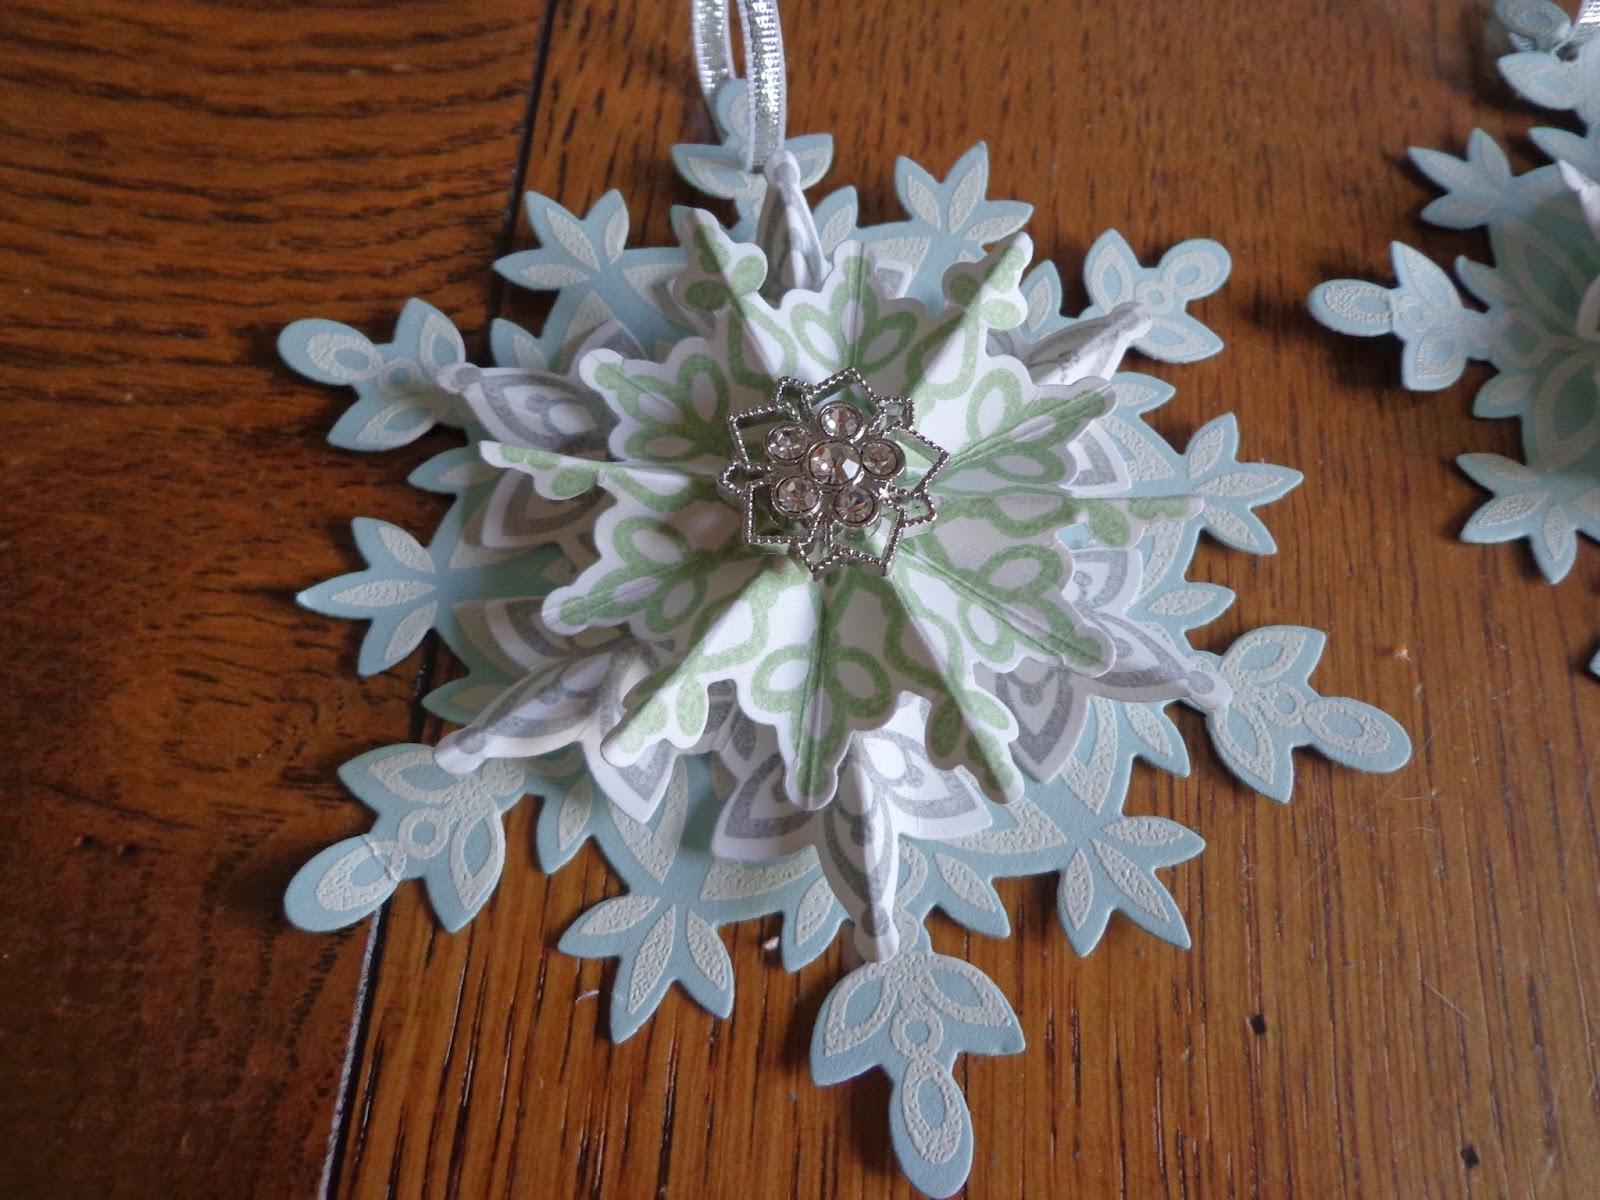 #6E3D23 Muriel D Loisirs Créatifs: Décoration De Noël 5409 decorations de noel en gros 1600x1200 px @ aertt.com